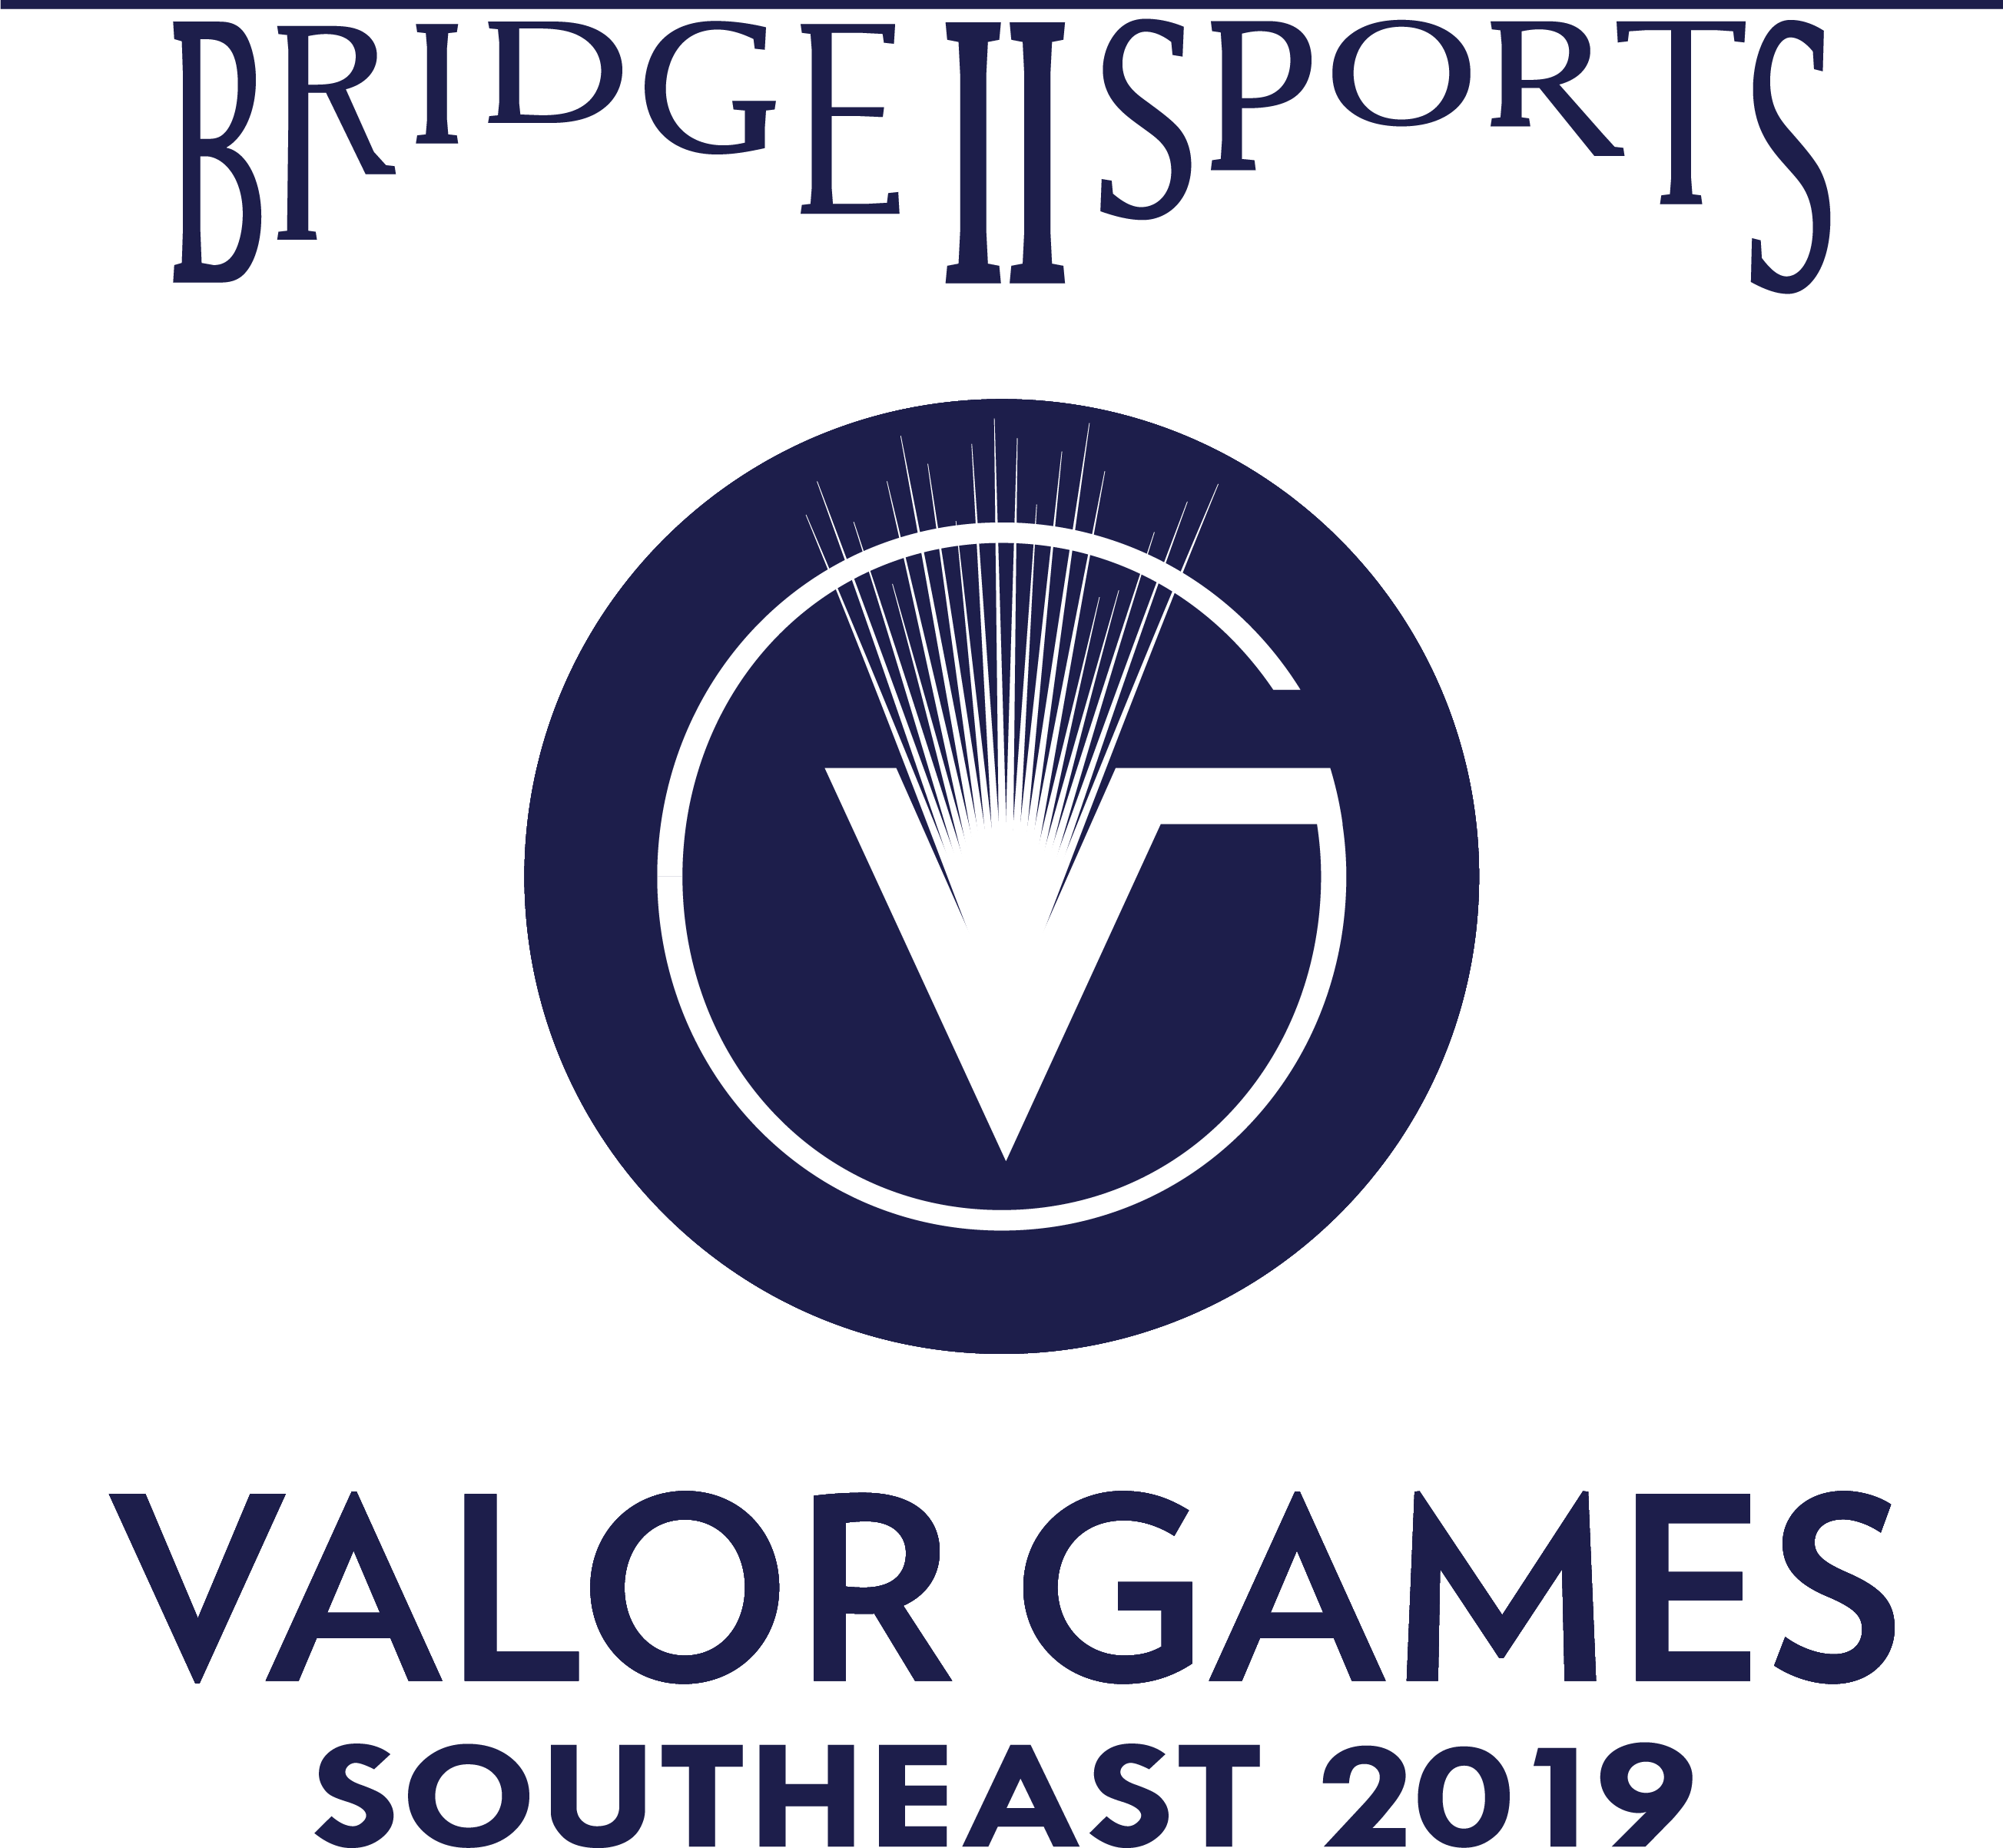 Valor Games Southeast 2019